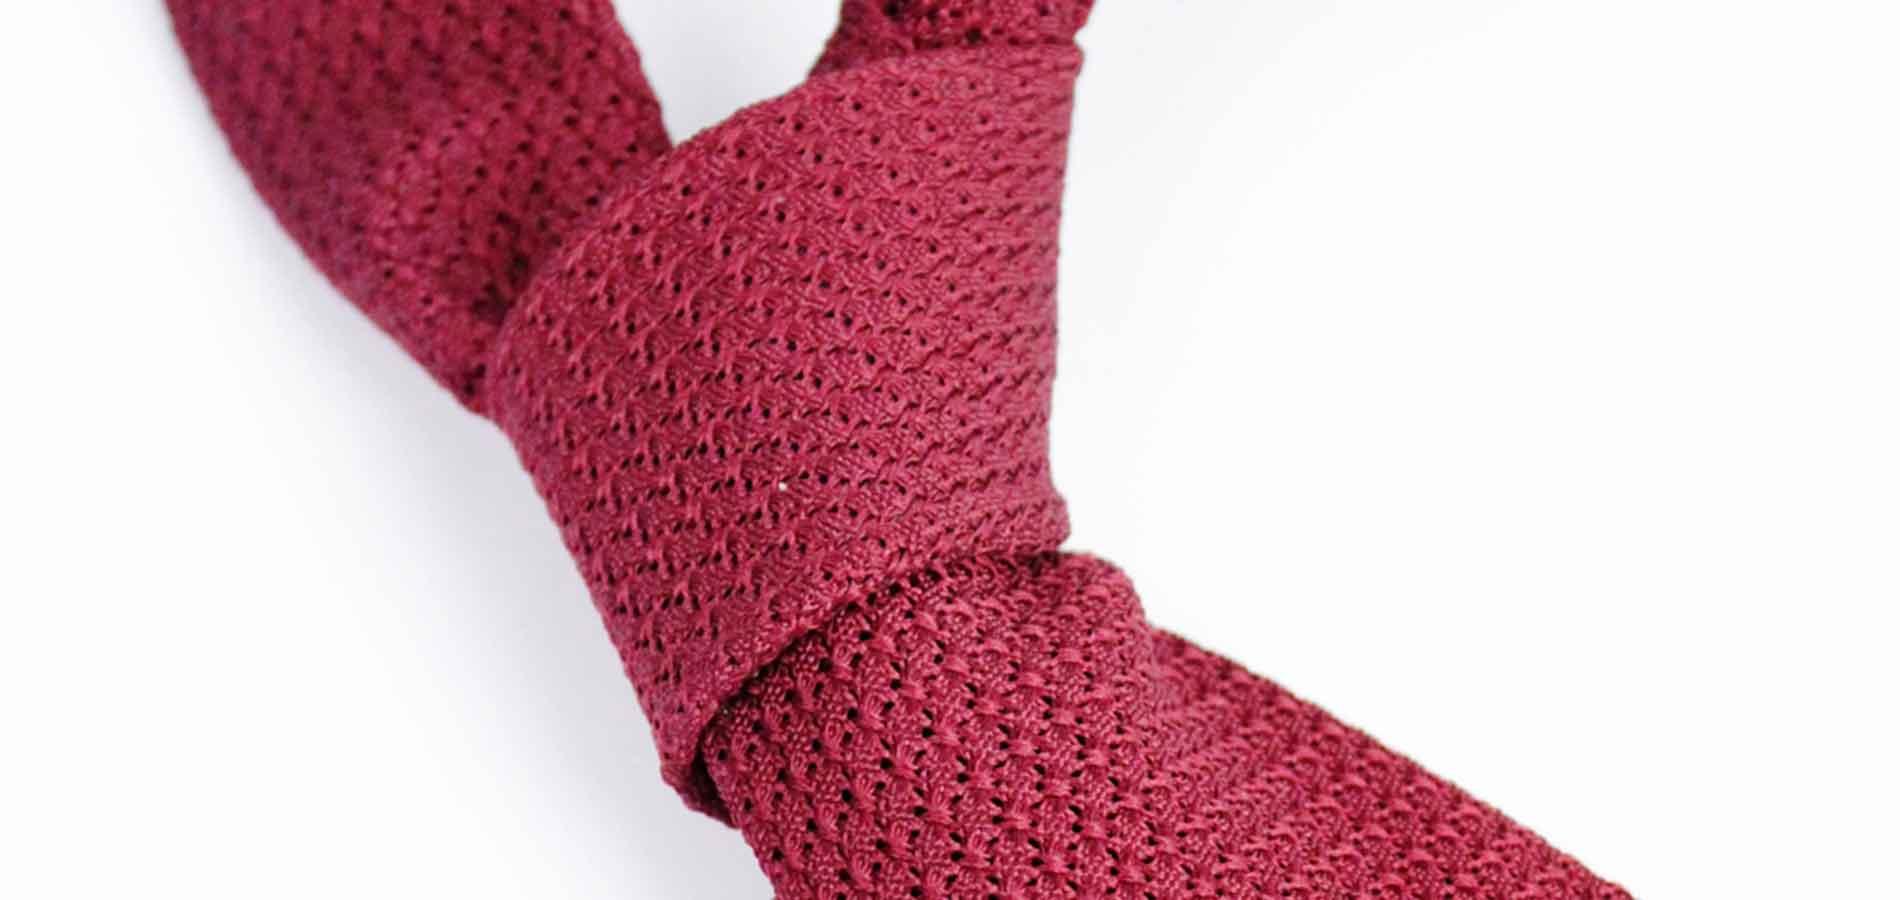 cravatta-garza-6-pieghe-3